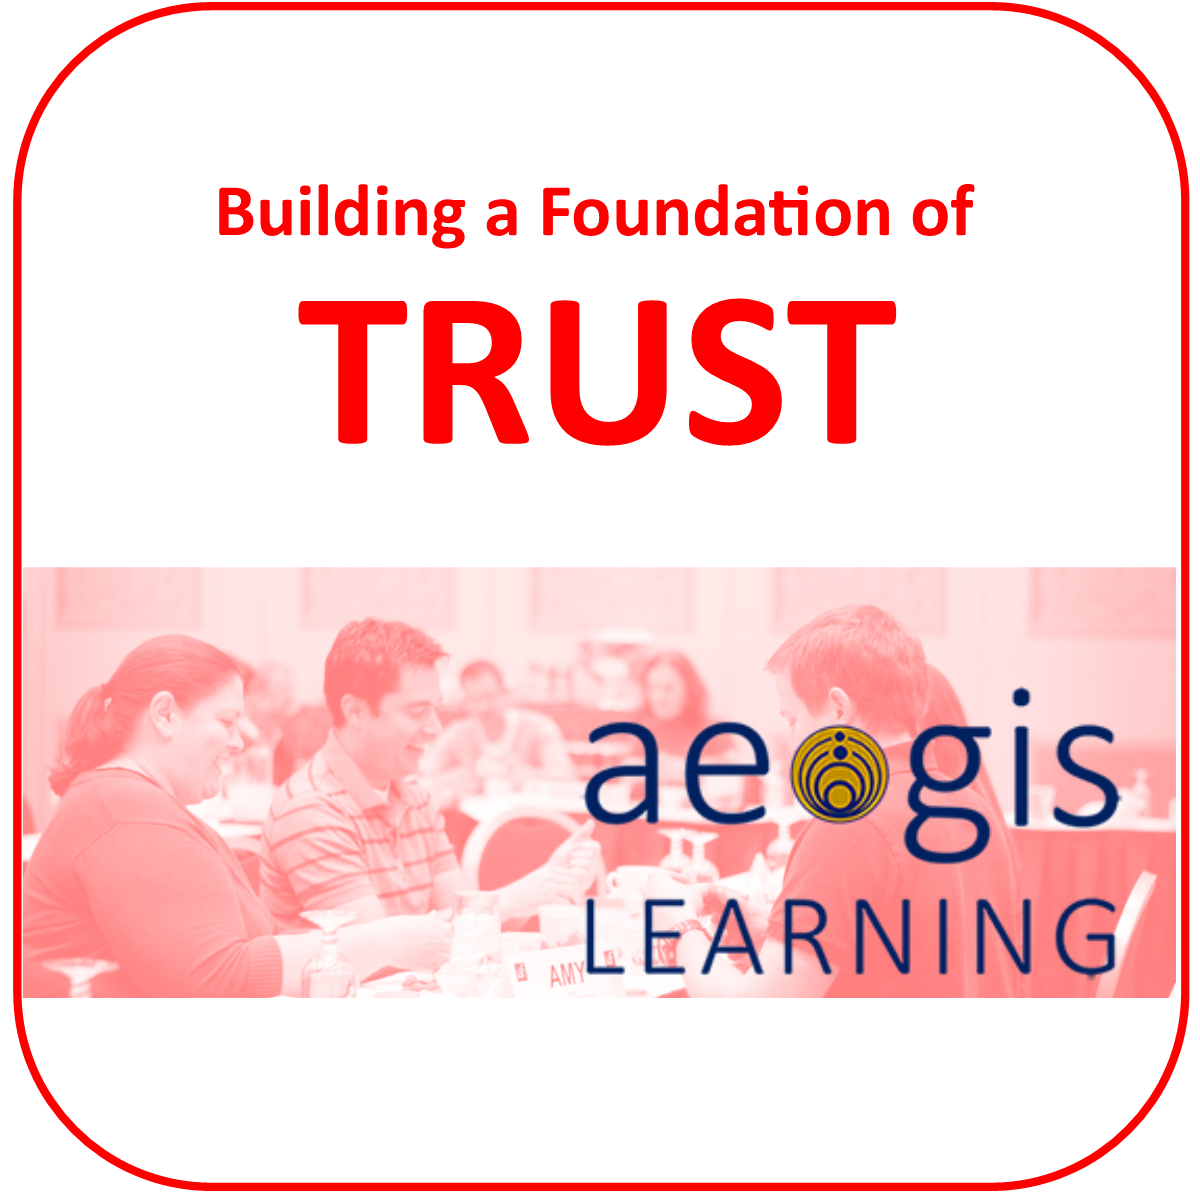 Teamwork Trust from Aegis Learning